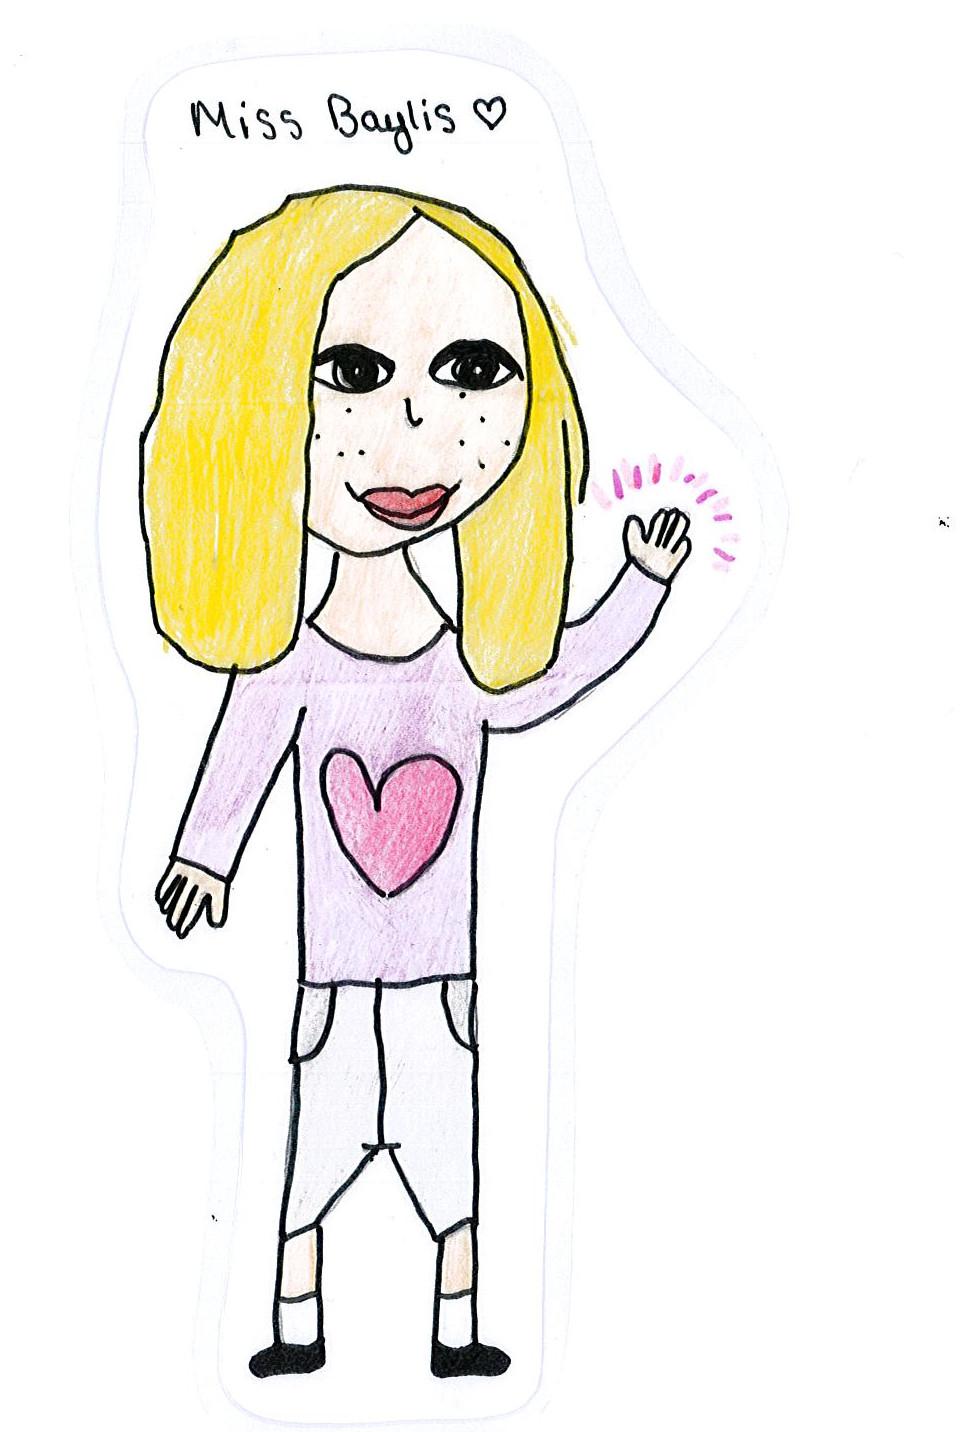 Miss Baylis